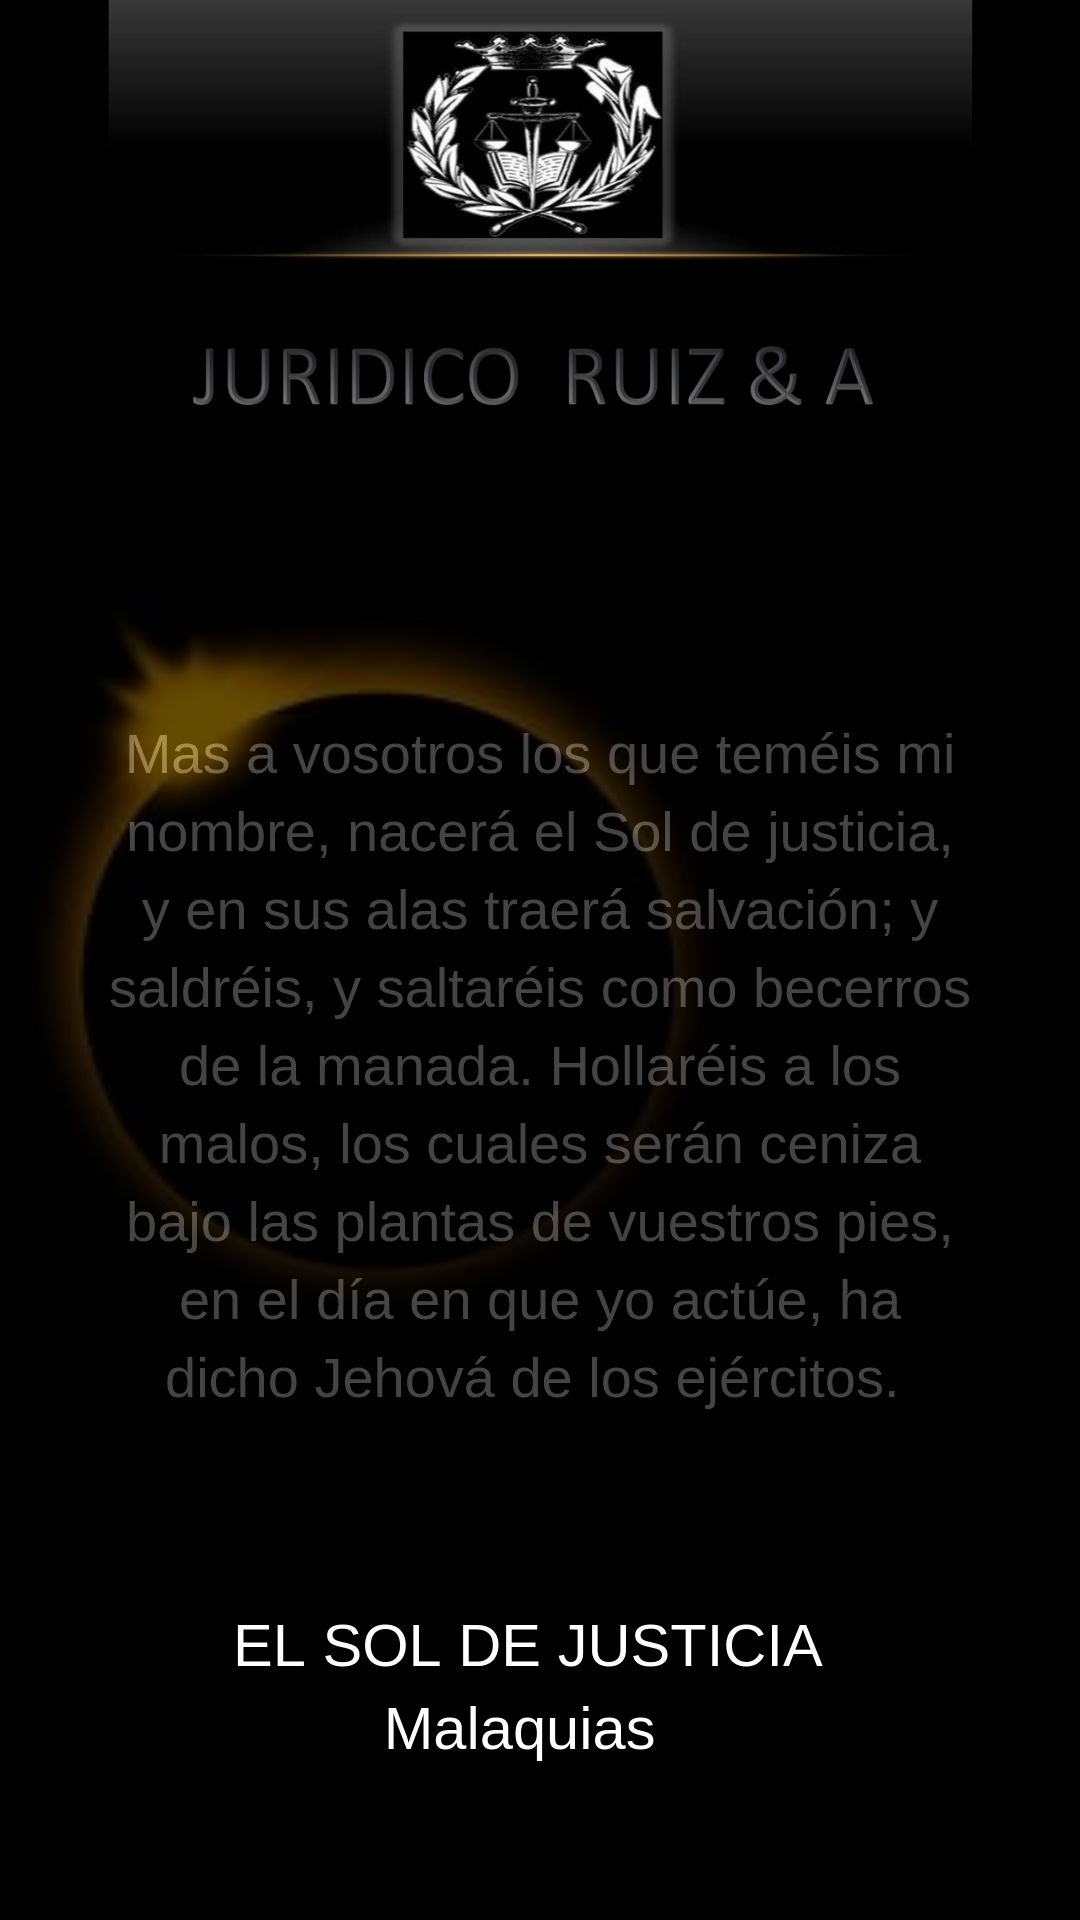 El Sol De Justicia Sol De Justicia Malaquias Nombres